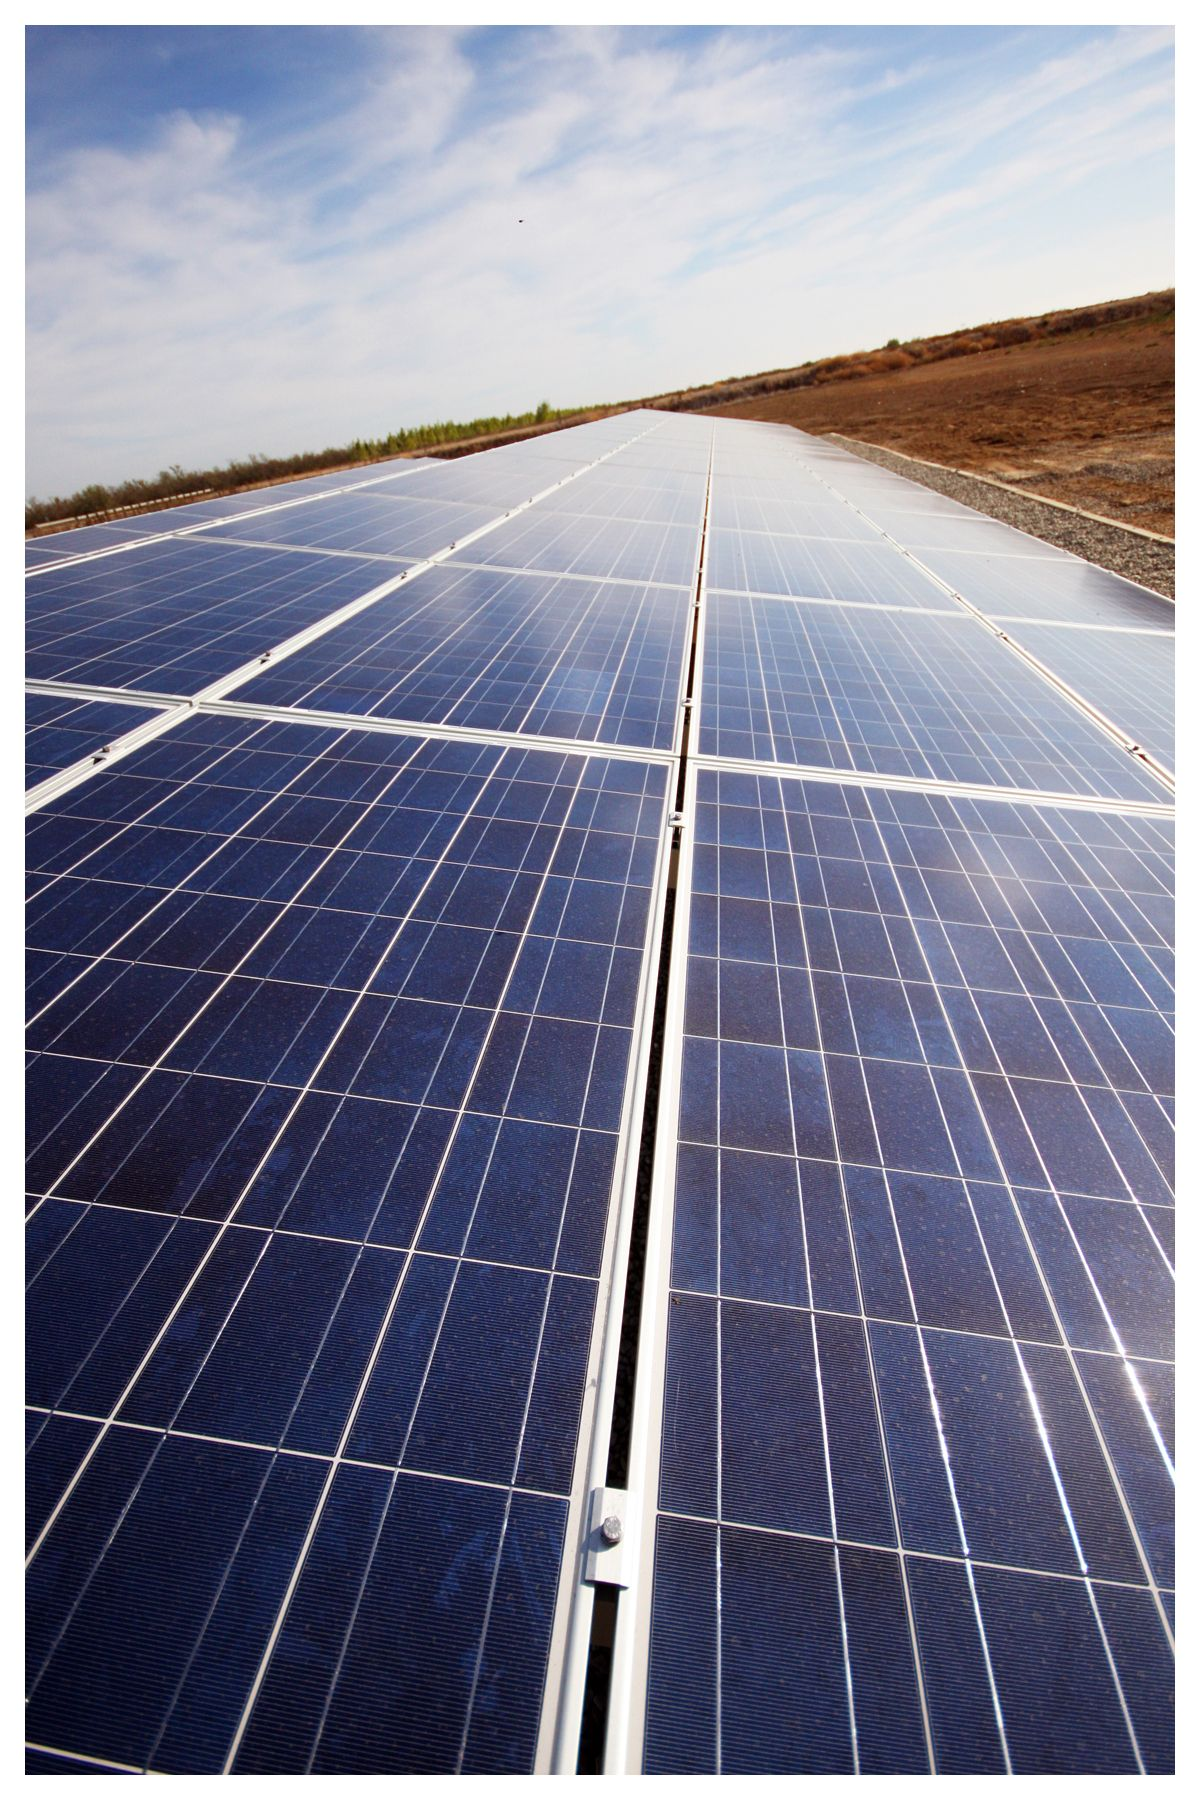 Ag Commercial Solar Ground Mount Installation By Ambassador Energy Central California Solar Installation Solar Installation